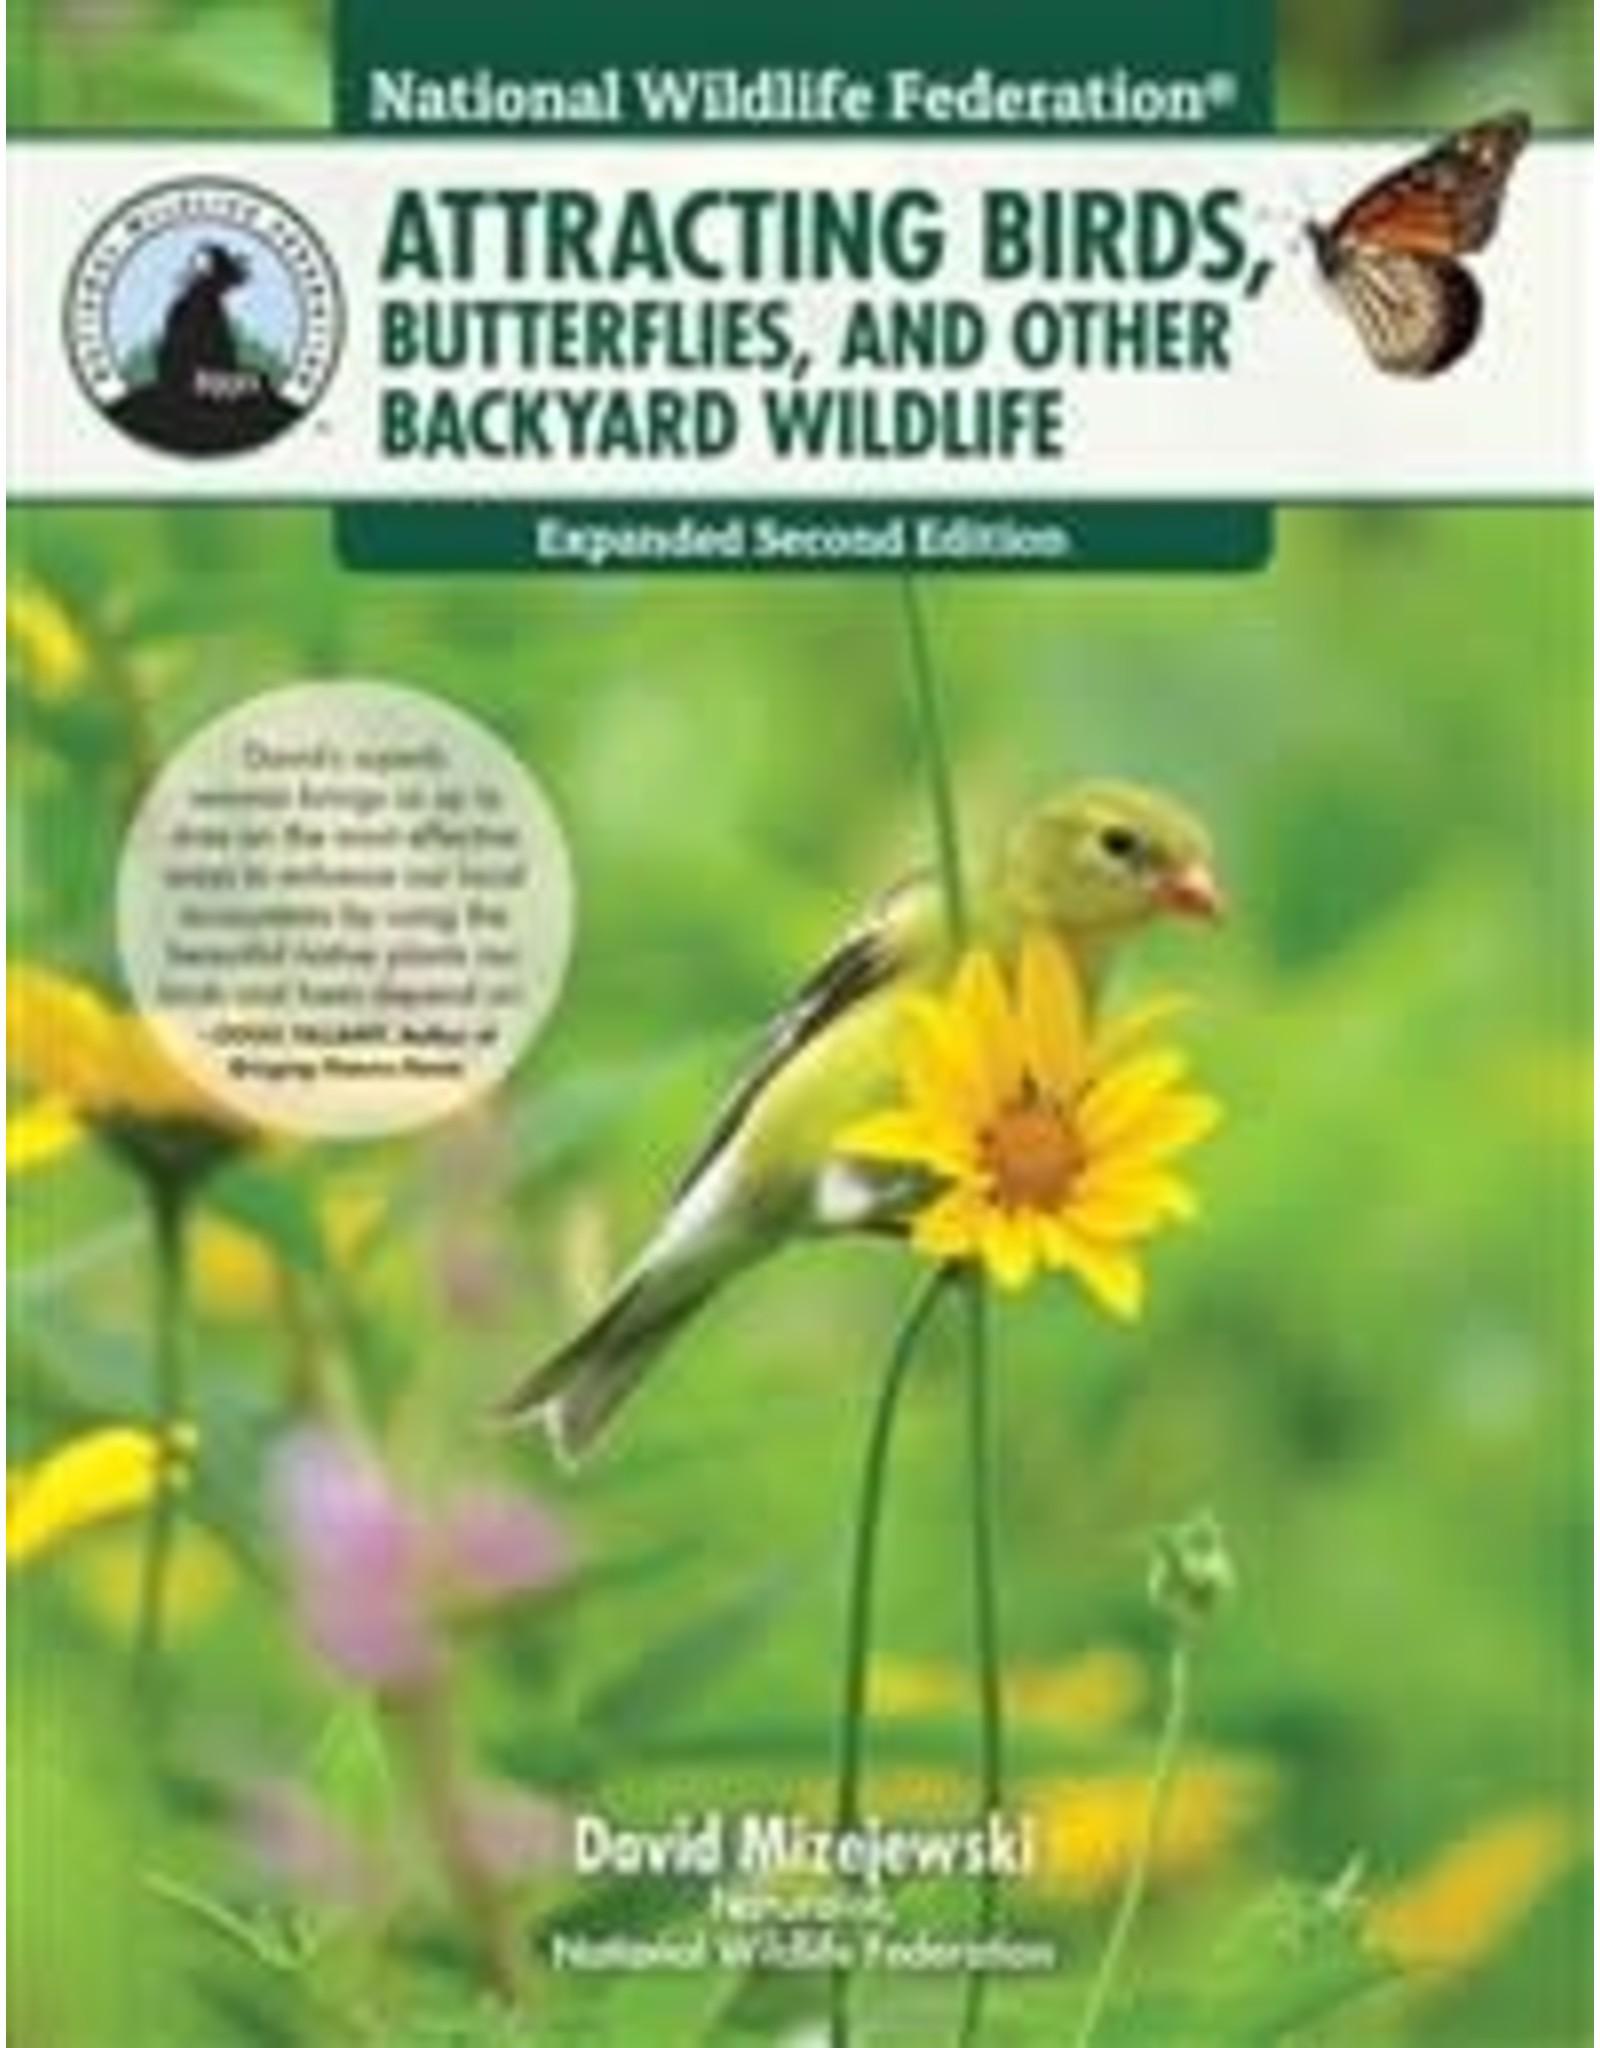 ABBBW Attracting Birds, Butterflies & Backyard Wildlife